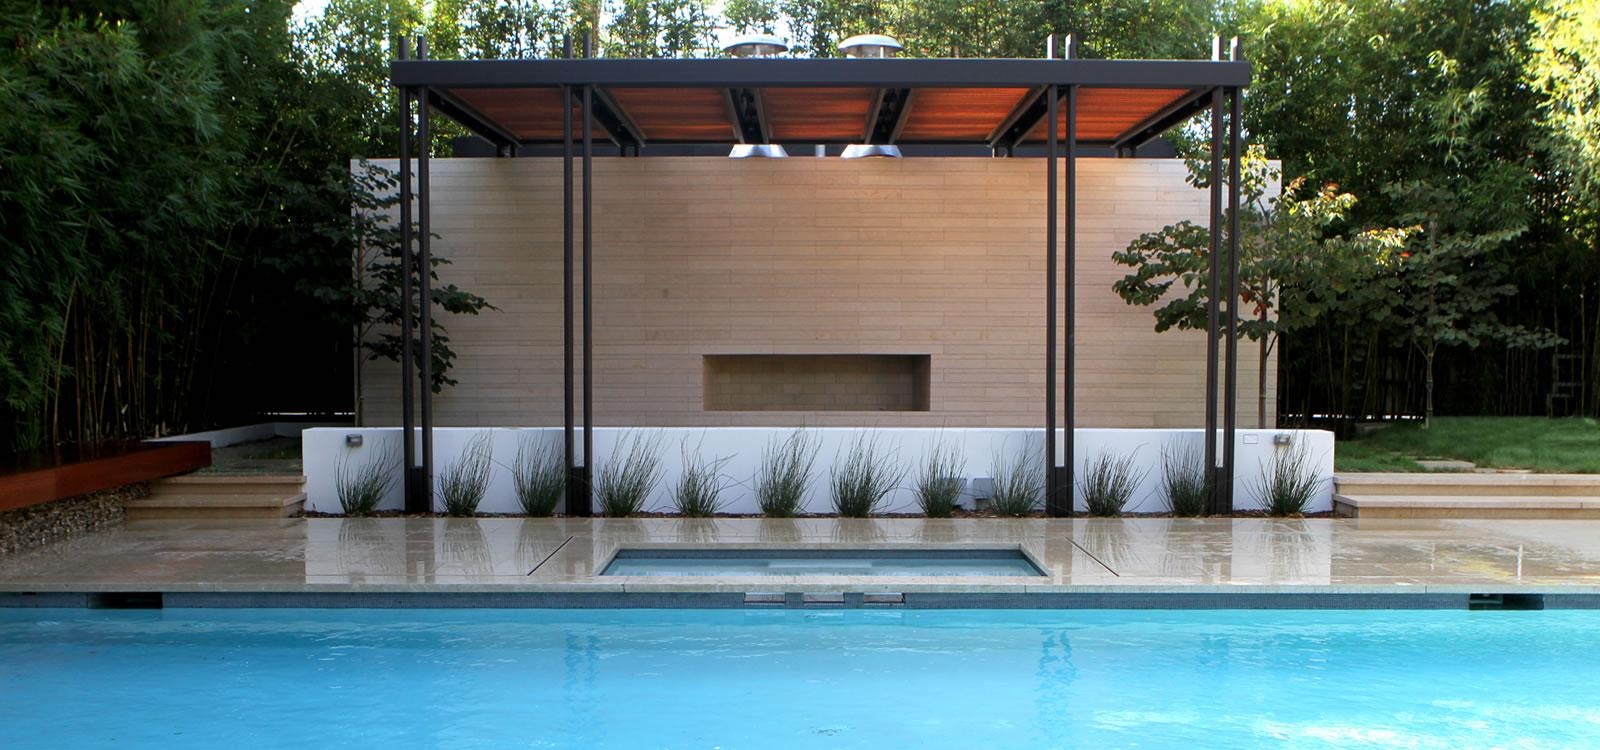 Index of /images/g-beverly-hills-pool-spa-design-custom